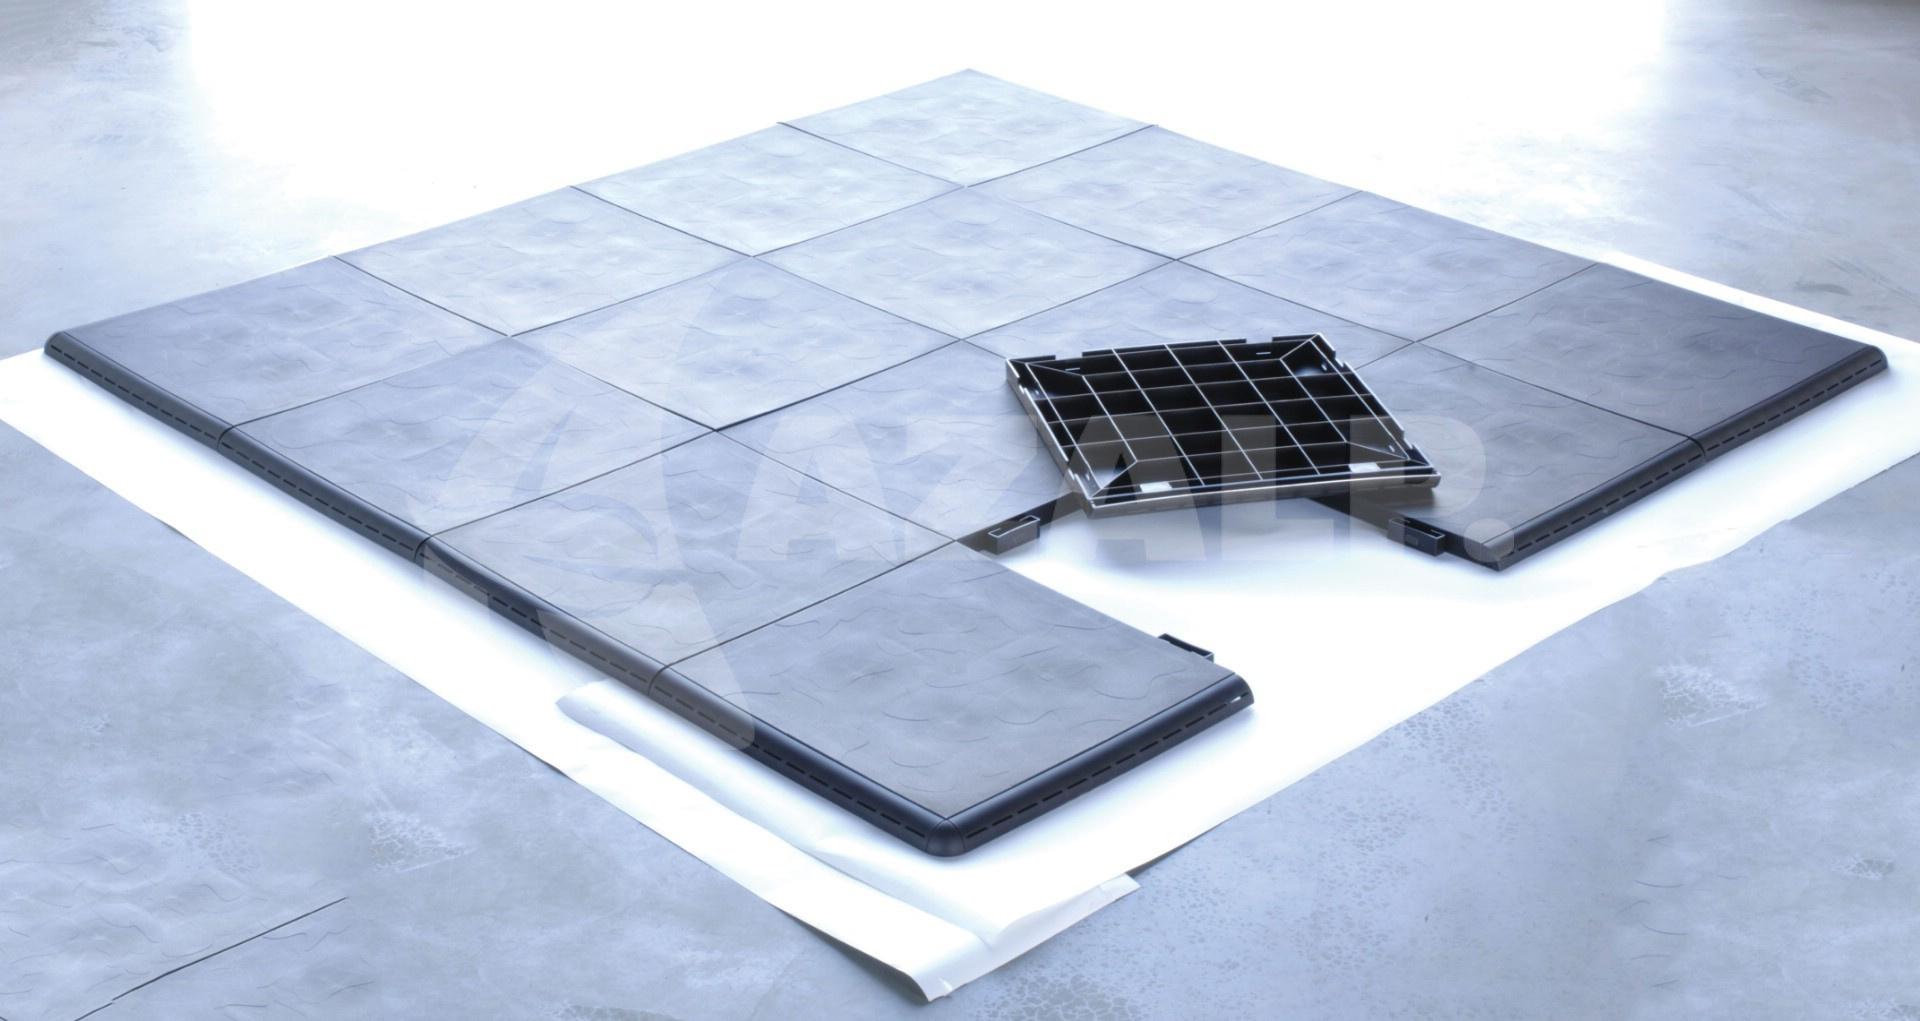 leisure concepts smartdeck 240 x 240 cm incl trimkit. Black Bedroom Furniture Sets. Home Design Ideas